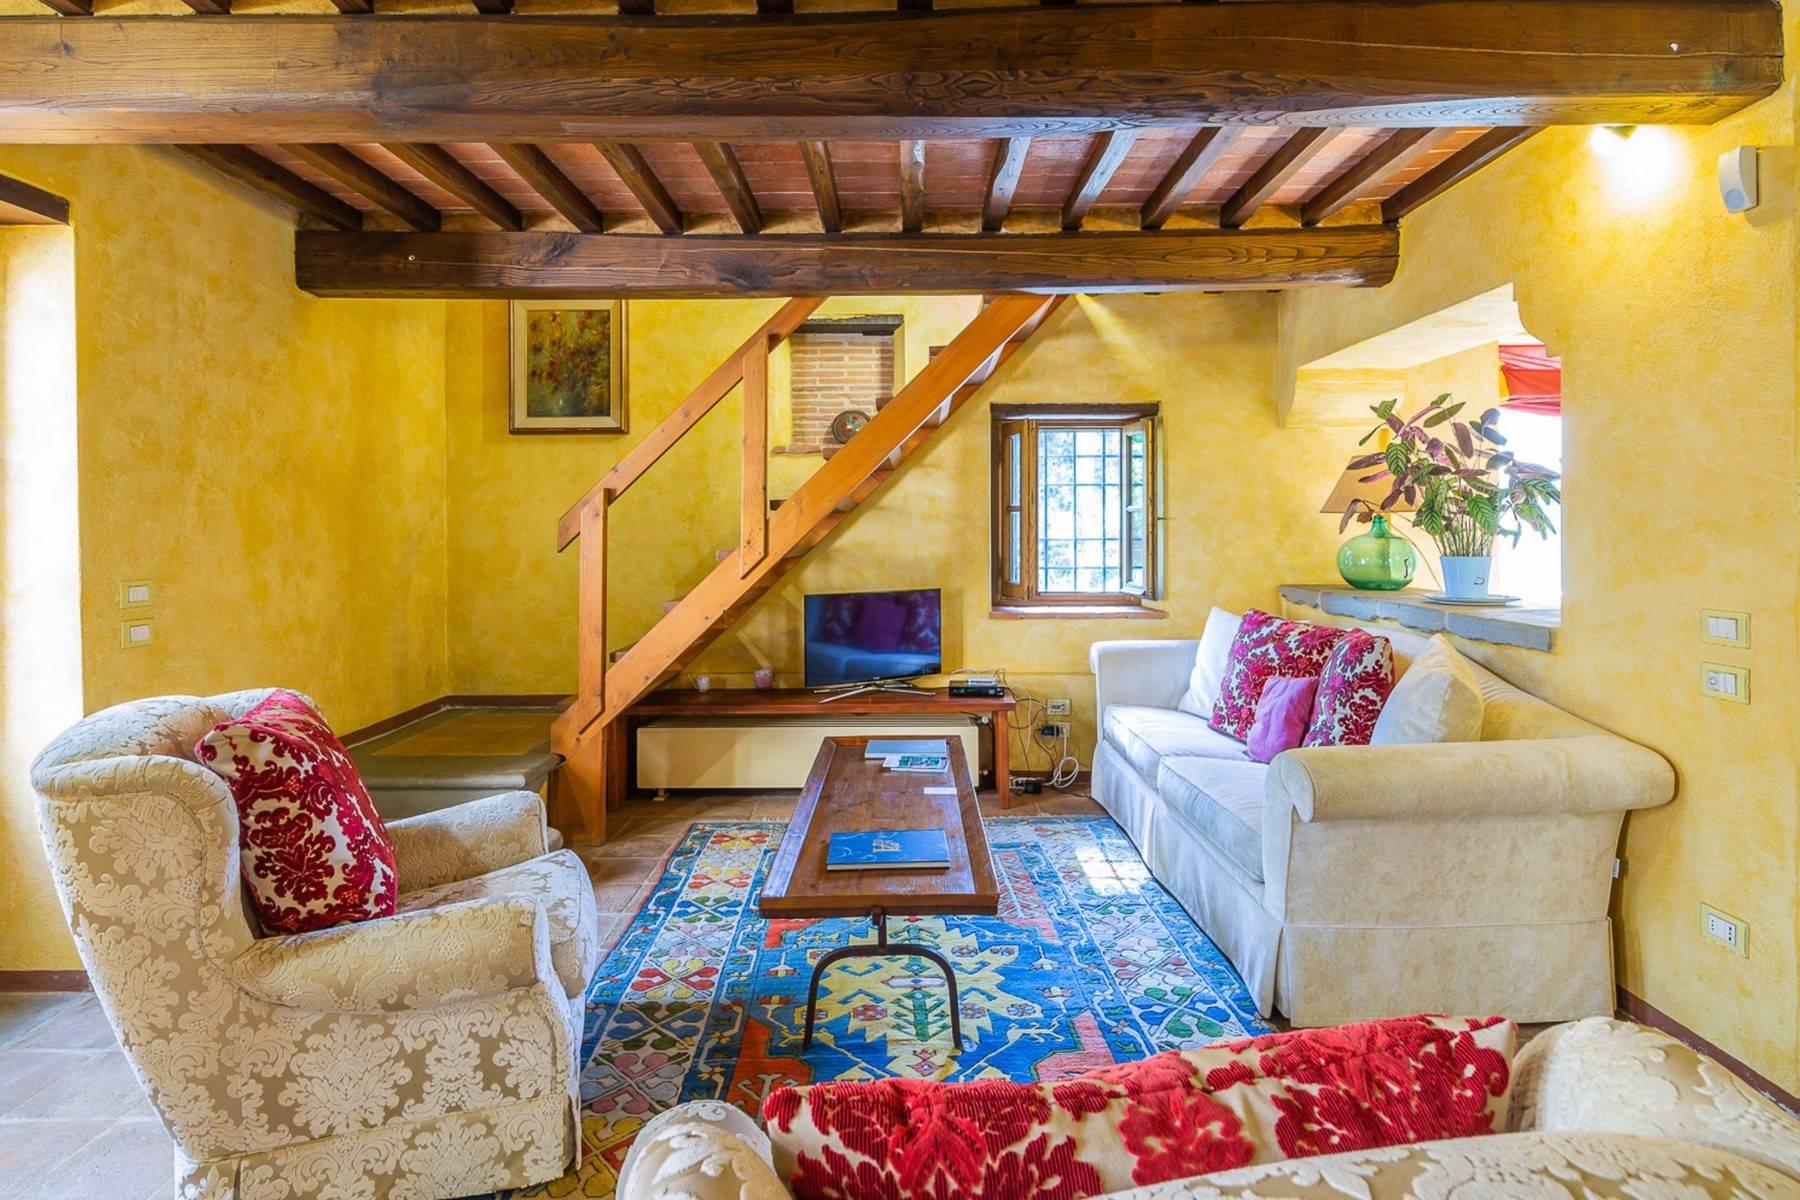 Villa in Vendita a Lucca: 5 locali, 1130 mq - Foto 18